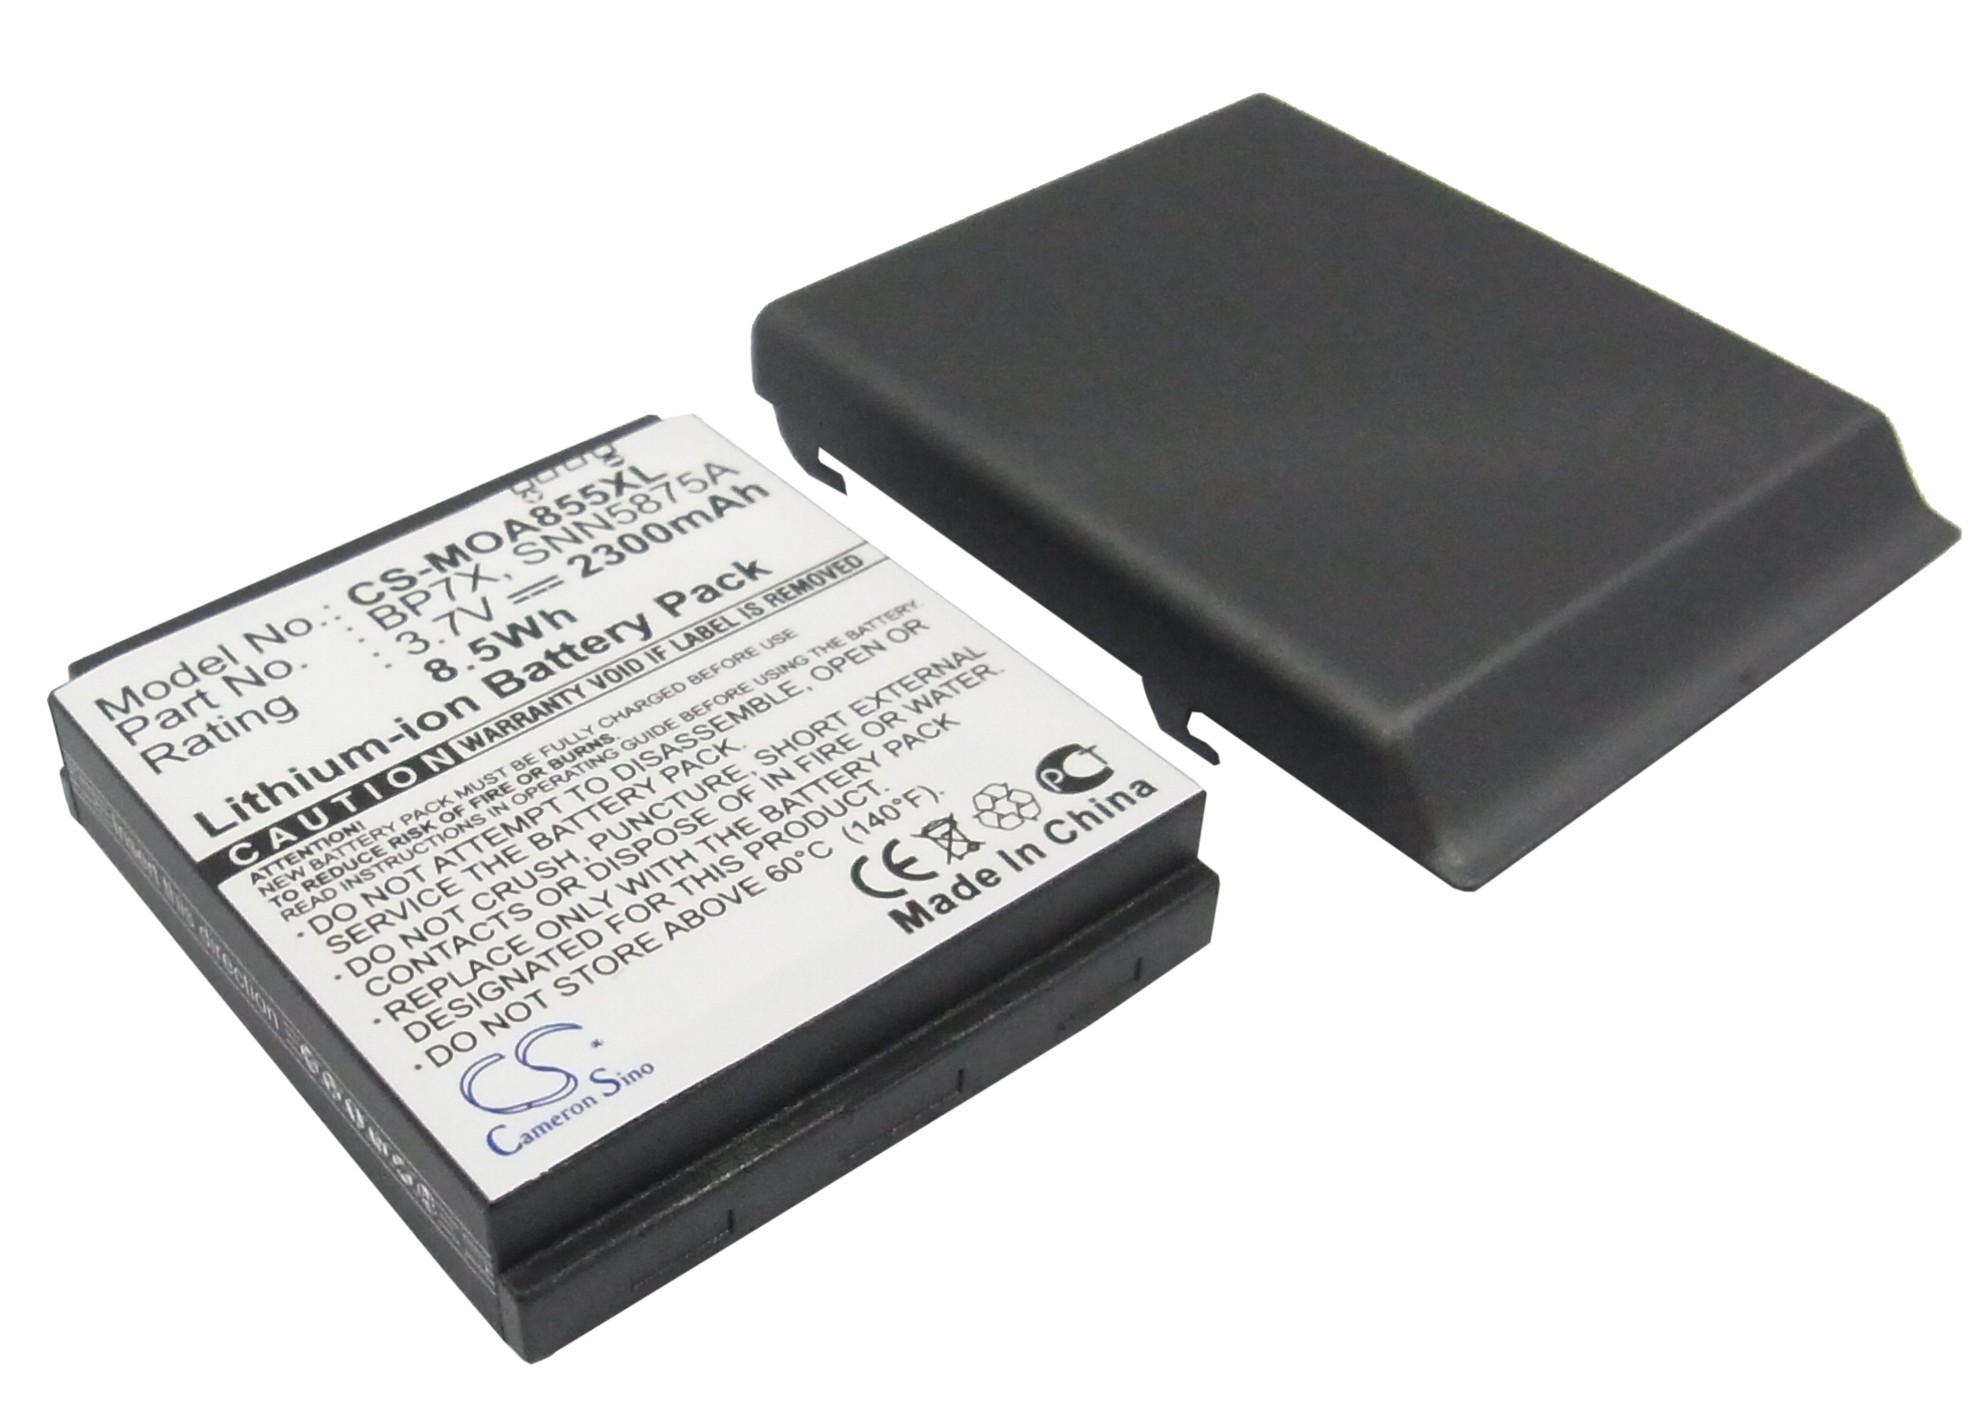 Cameron Sino baterie do mobilů pro MOTOROLA Milestone 3.7V Li-ion 2300mAh kovová šedá - neoriginální